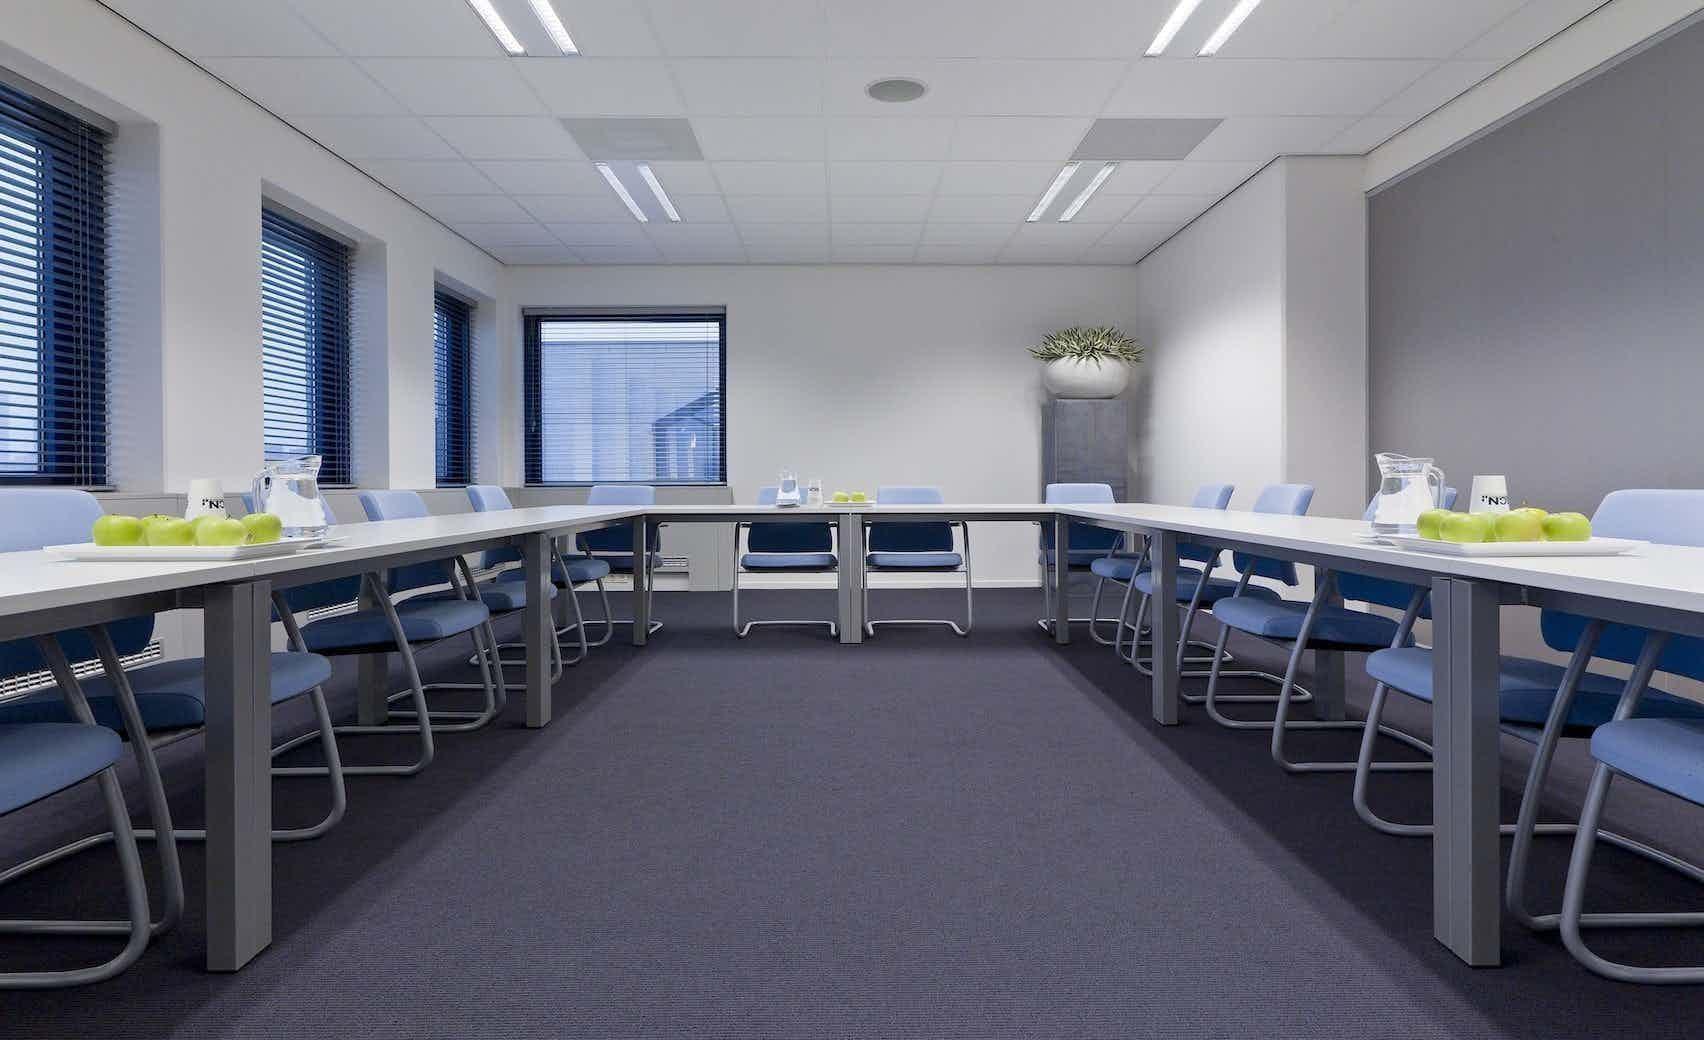 Room 3.2, BCN Utrecht Cantraal Station